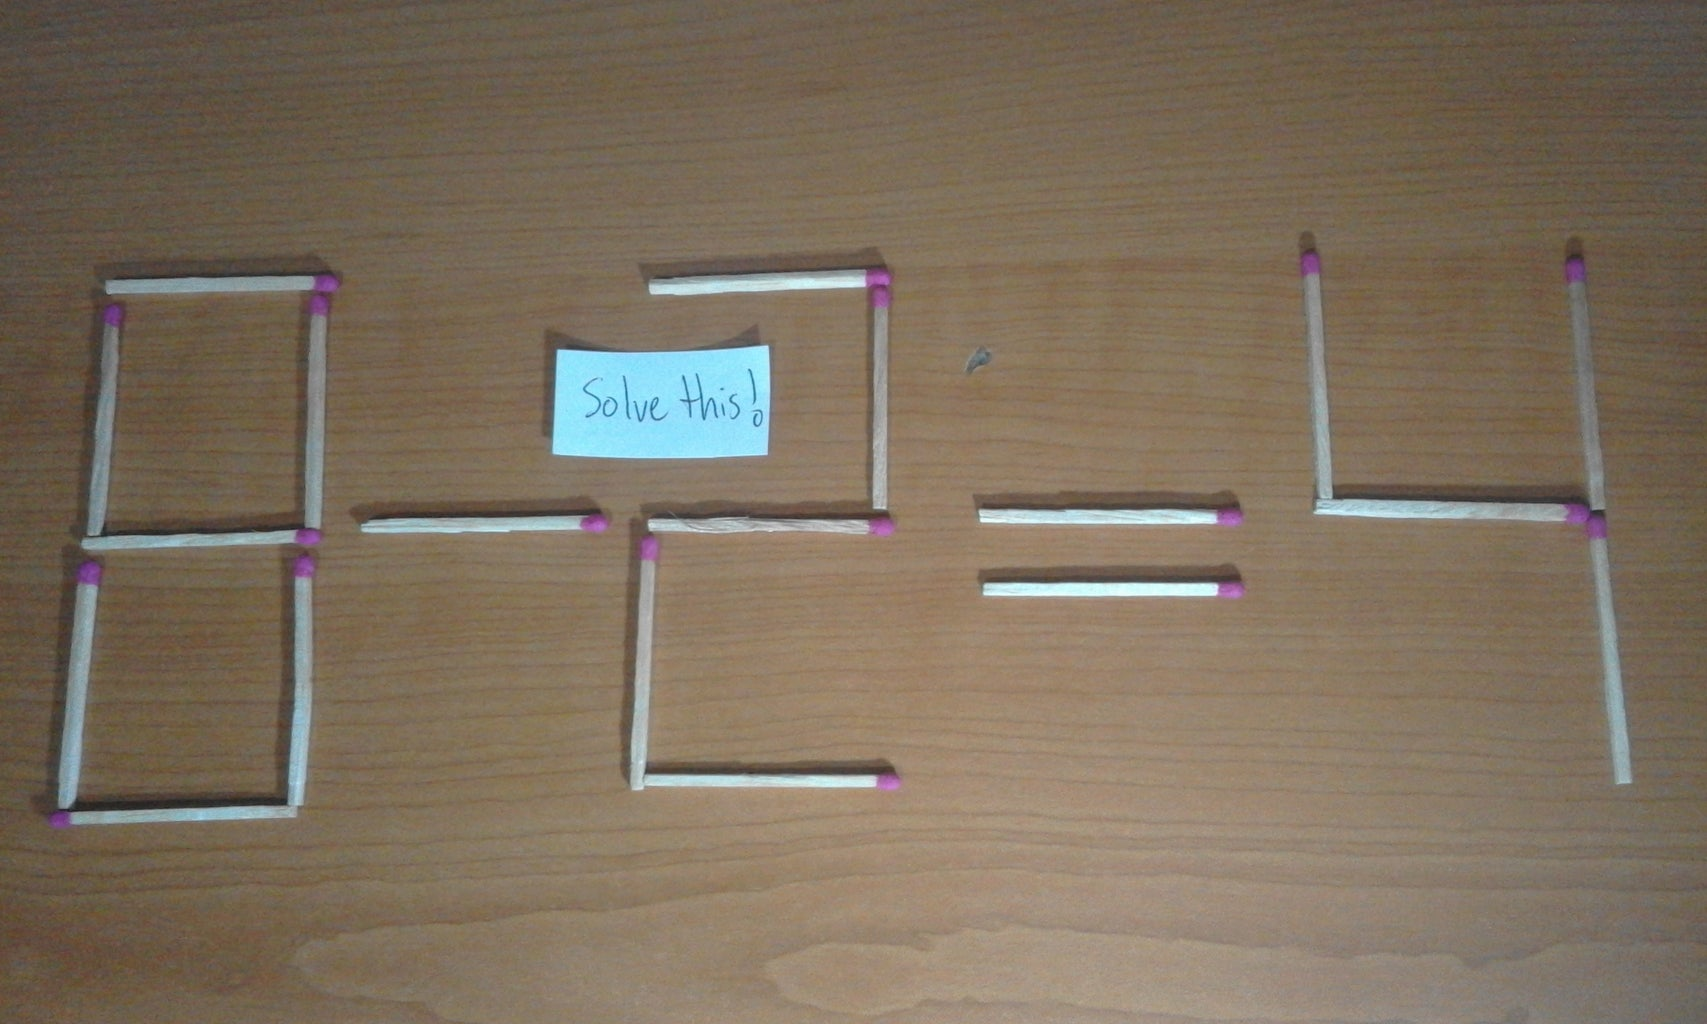 Puzzle #6 (Hard)